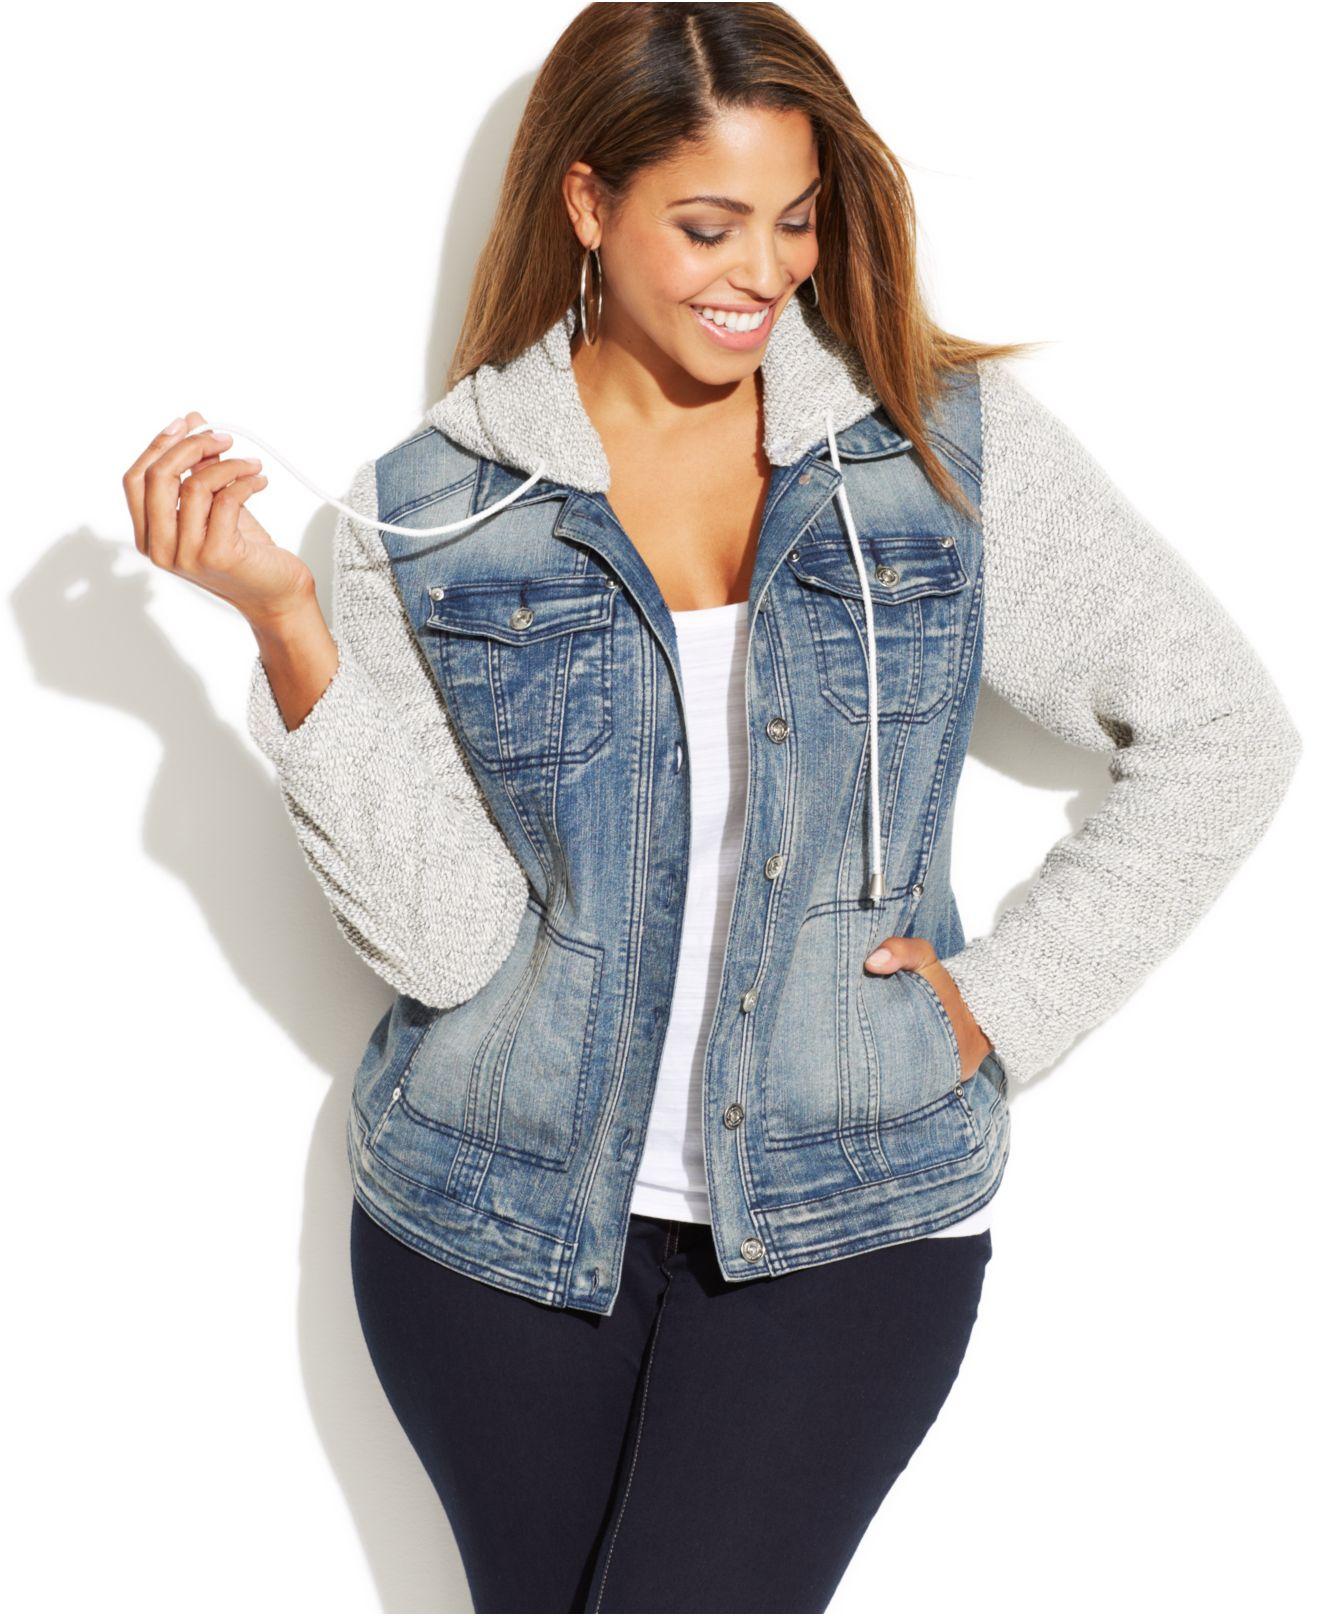 Inc international concepts Plus Size Denim Hoodie Jacket in Blue ...